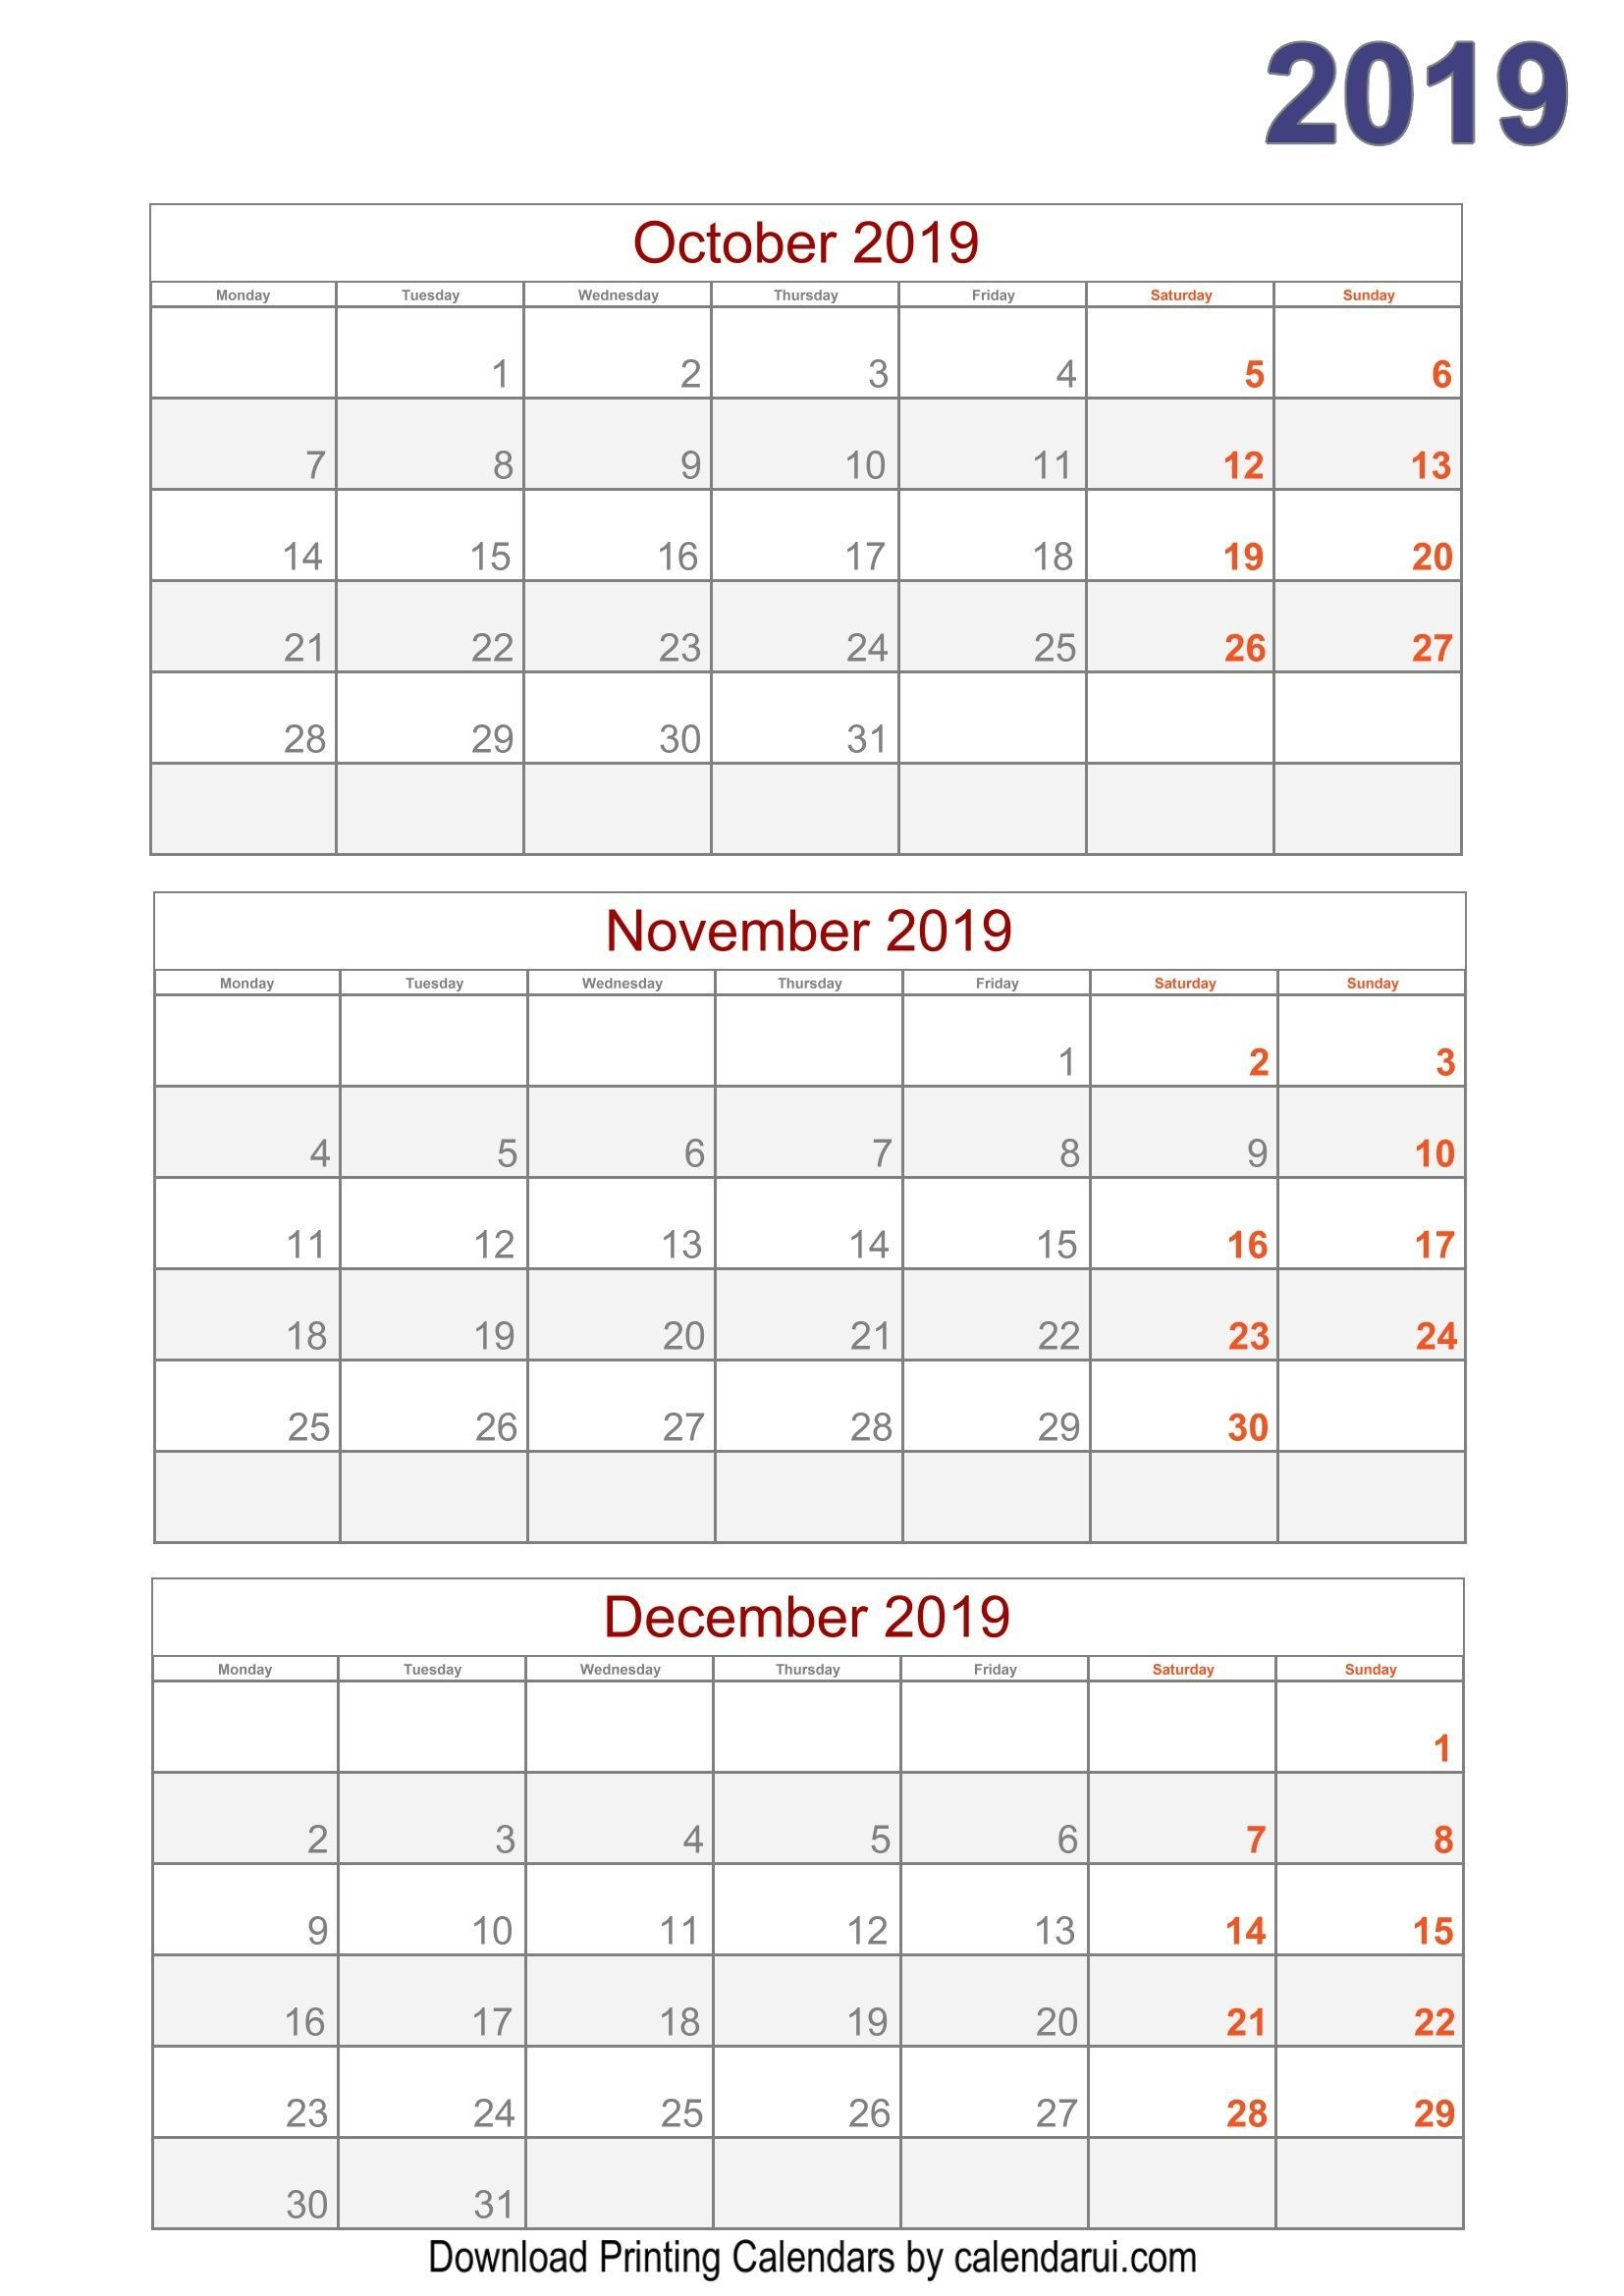 Free Printable Calendar I Can Type In | Calendar